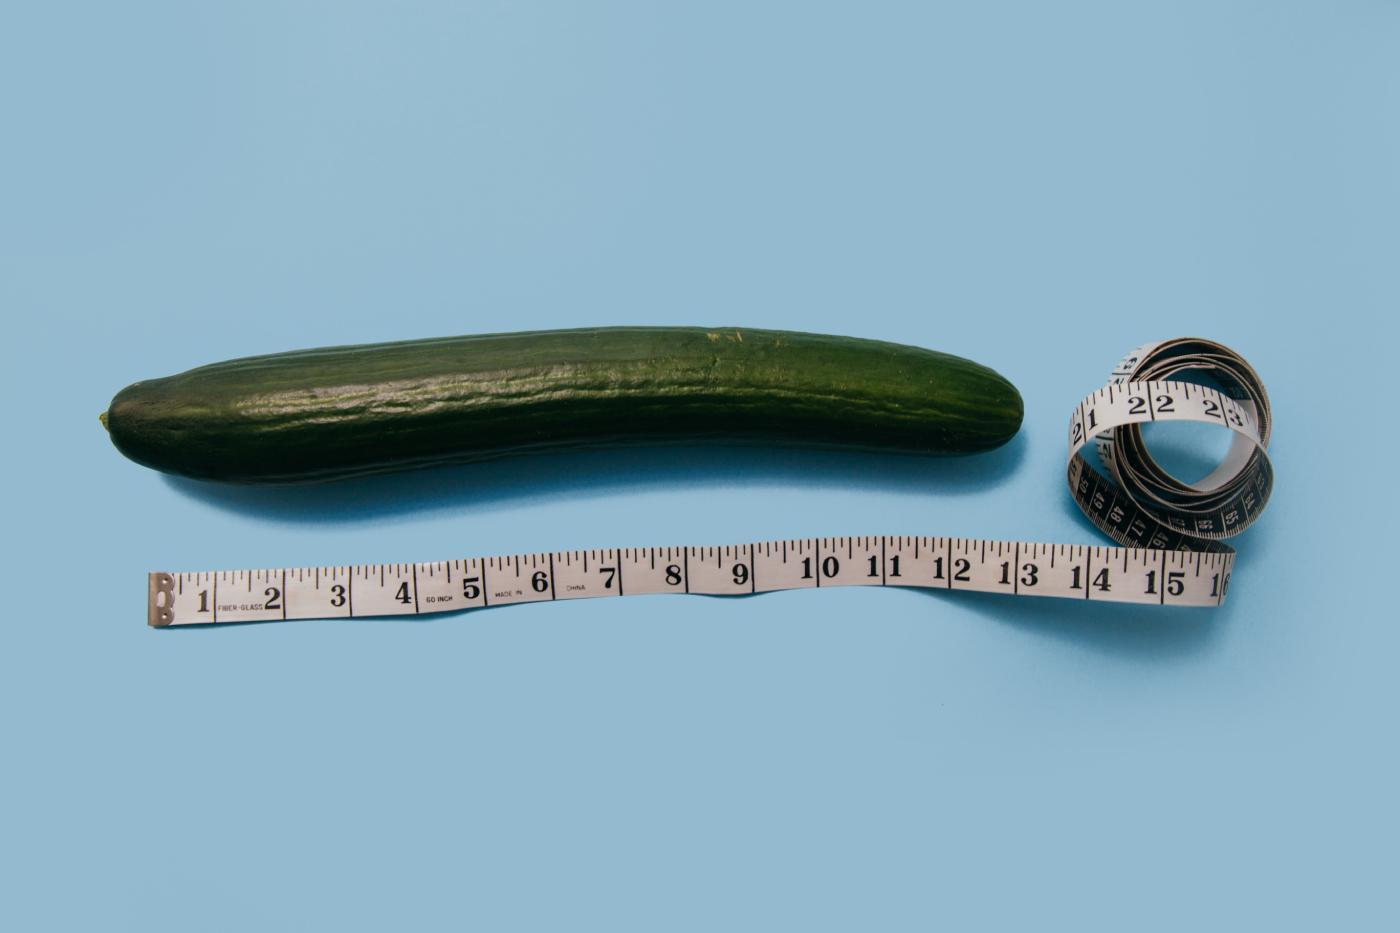 erekció puha pénisz